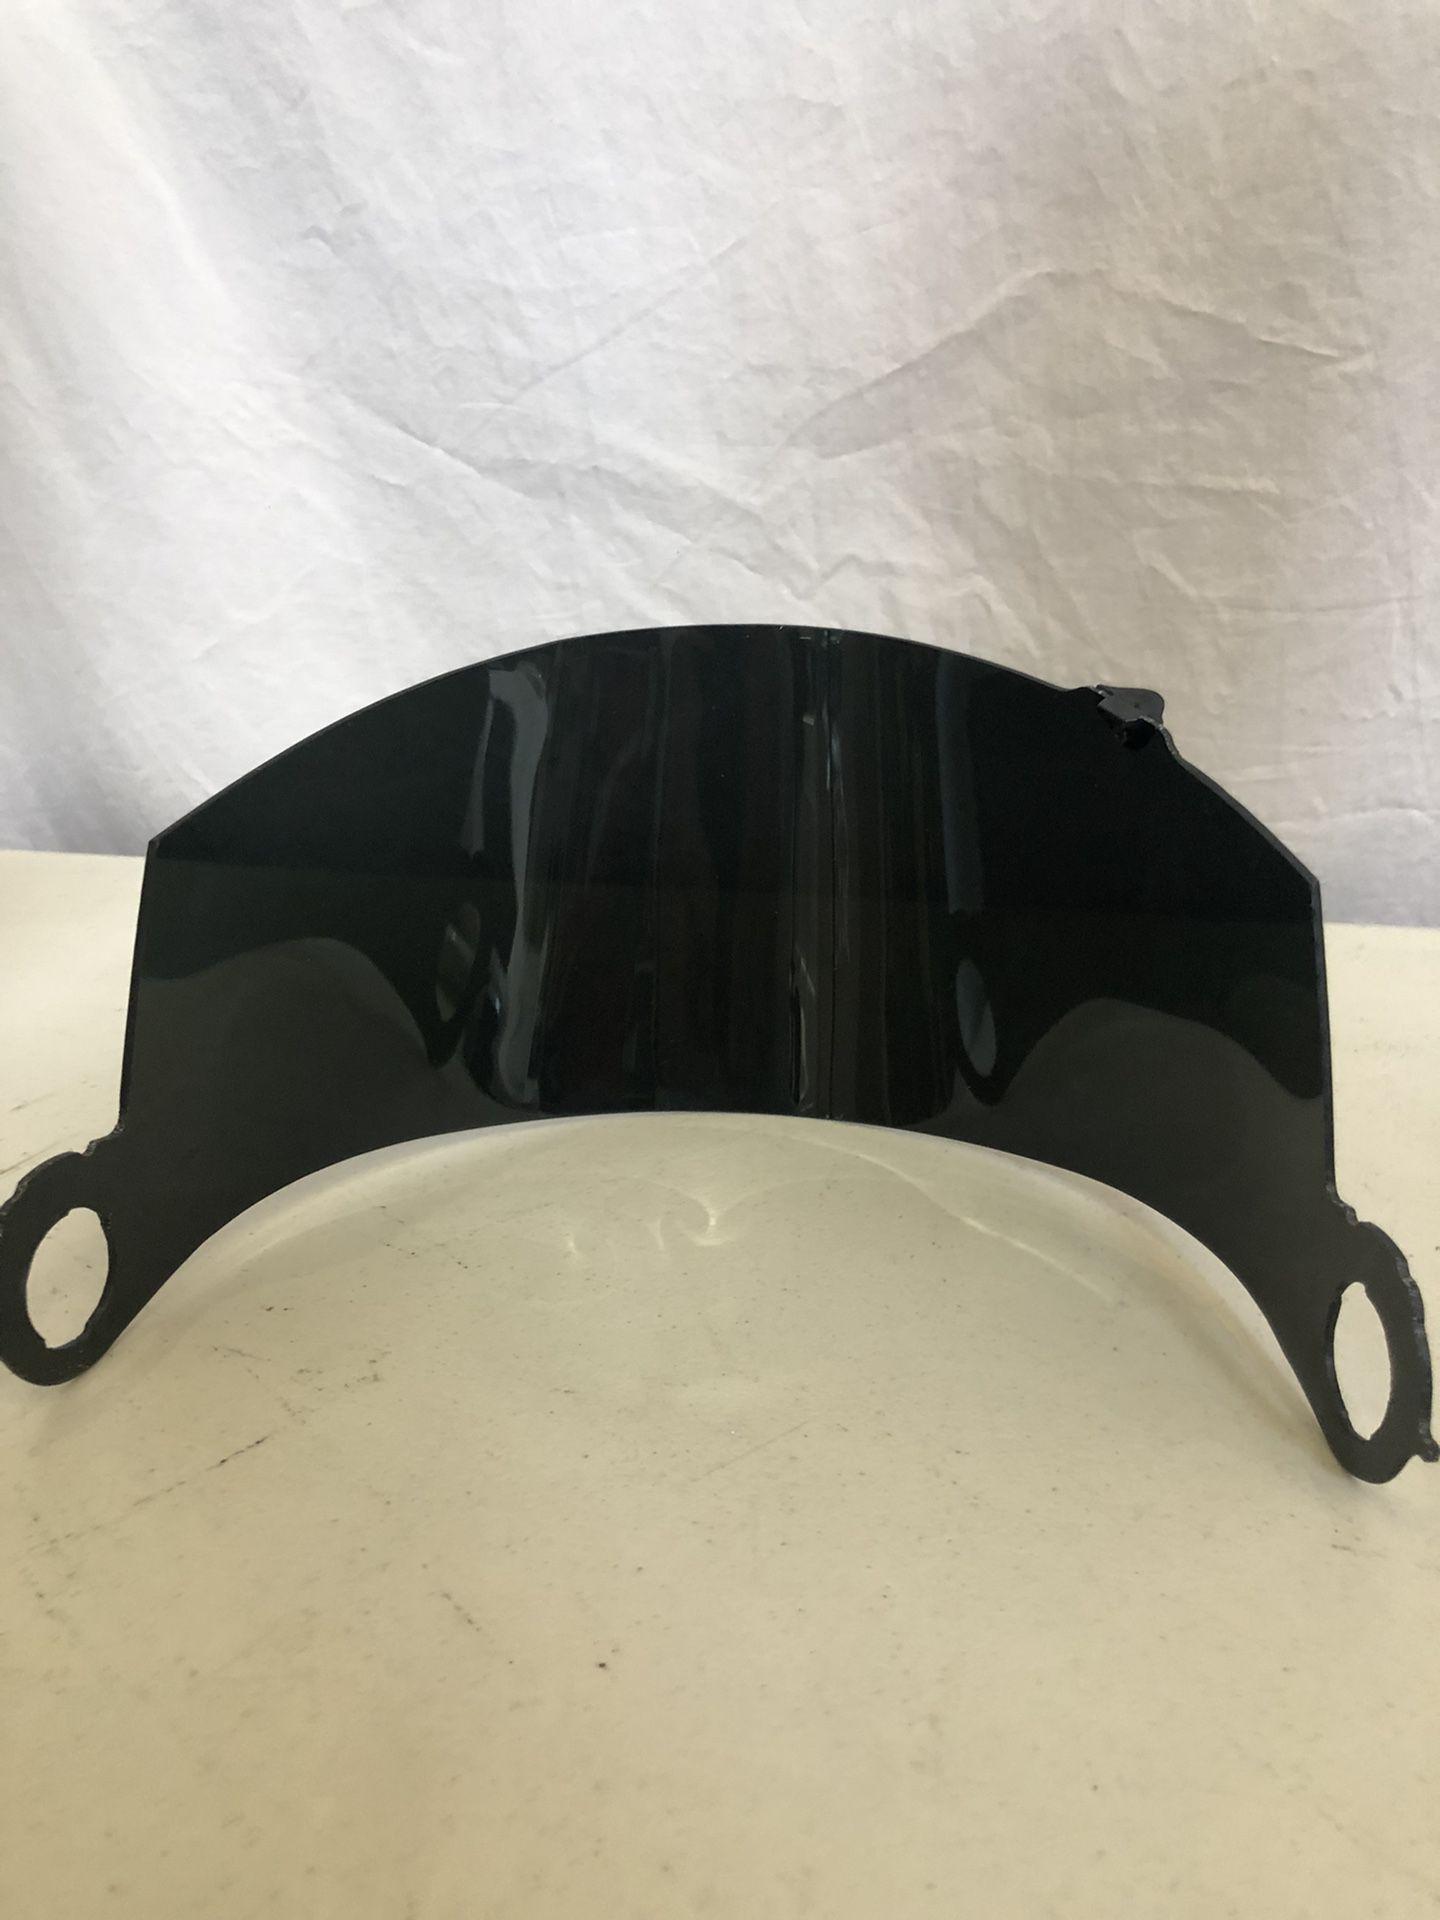 SUOMY SPECR1 Mirror Iridium Chrome Face Shield , Anti Fog, KASPVA, New